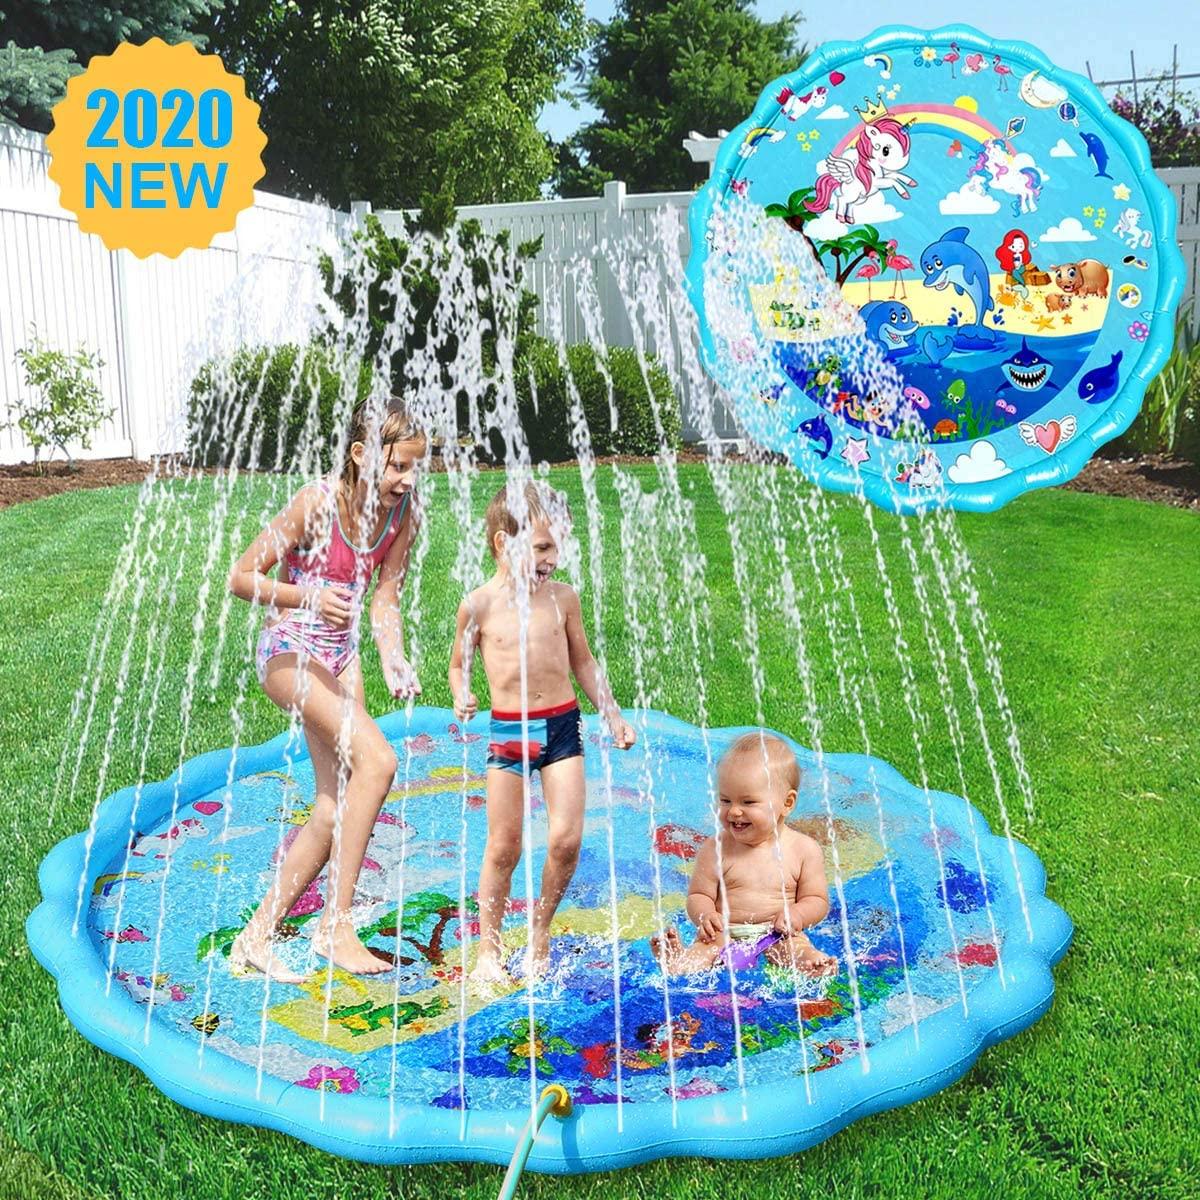 Splash Pad for Kids, Unicorn Upgraded 2020 Version Large 68'' SprinklerPlay Mat Backyard Summer Fun Water PadOutdoor Play Sprinklers for 1-12 Years Boys Girls